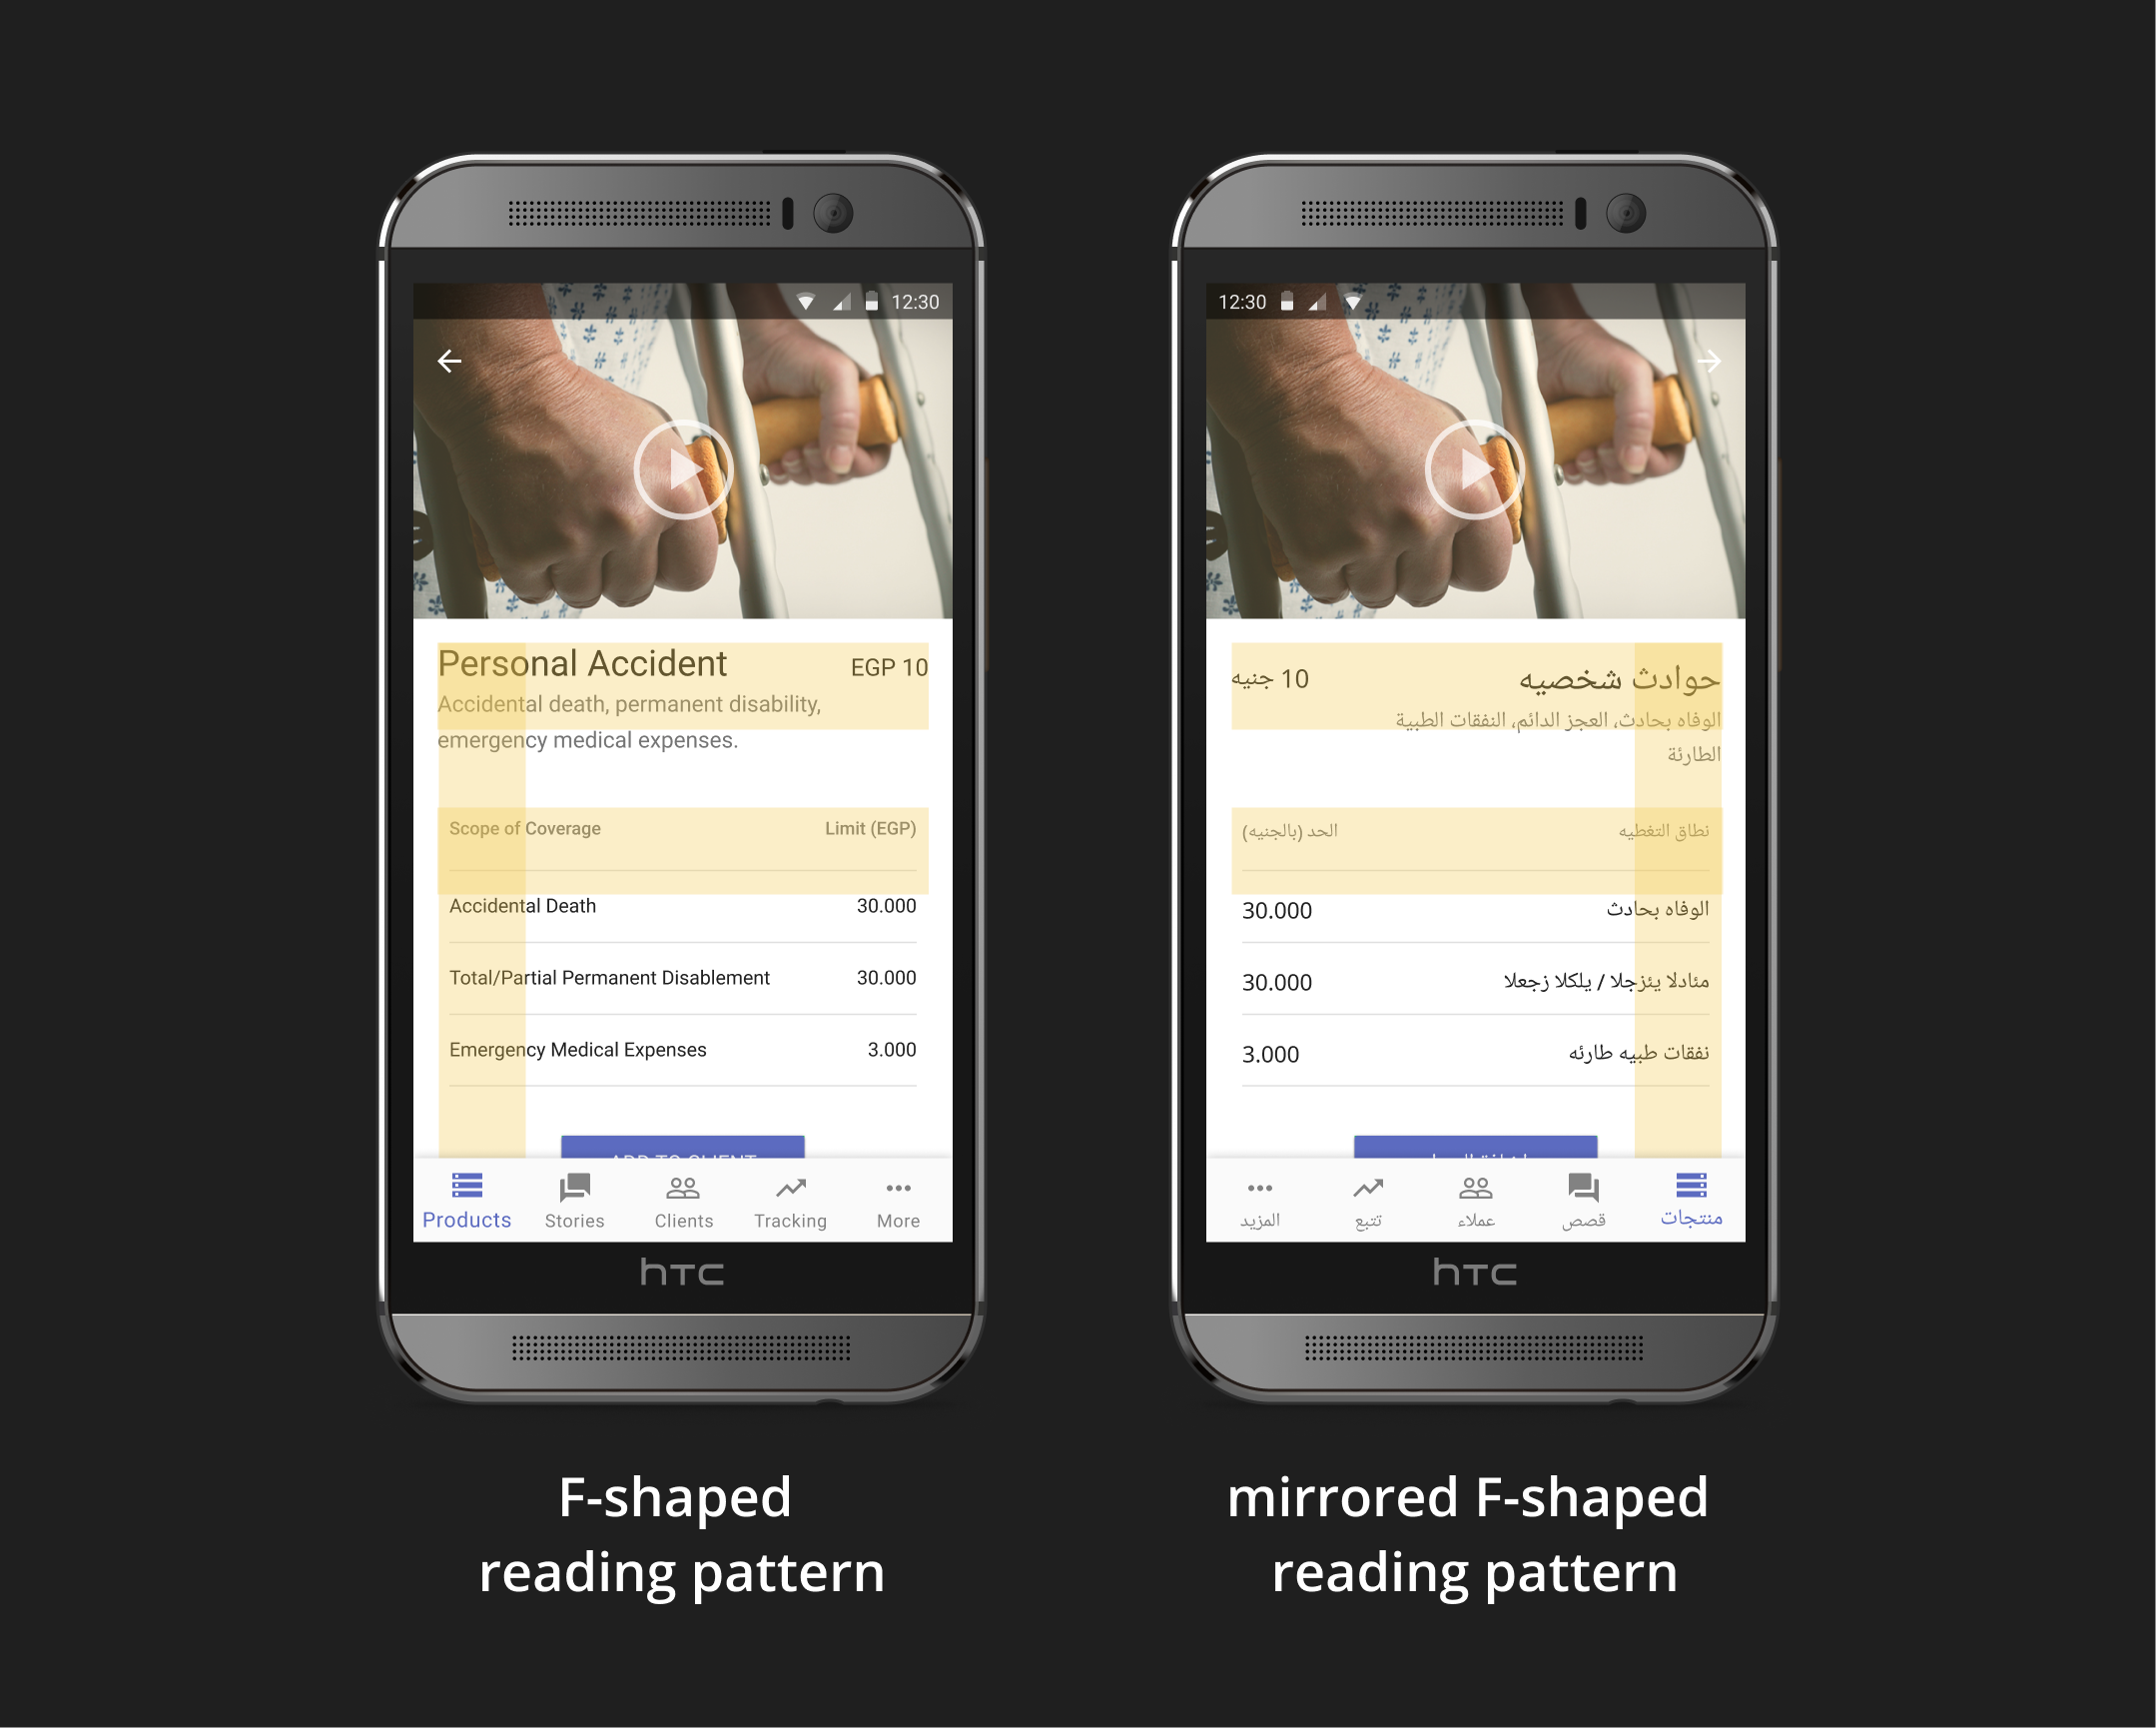 Mirrored F-shaped reading pattern.